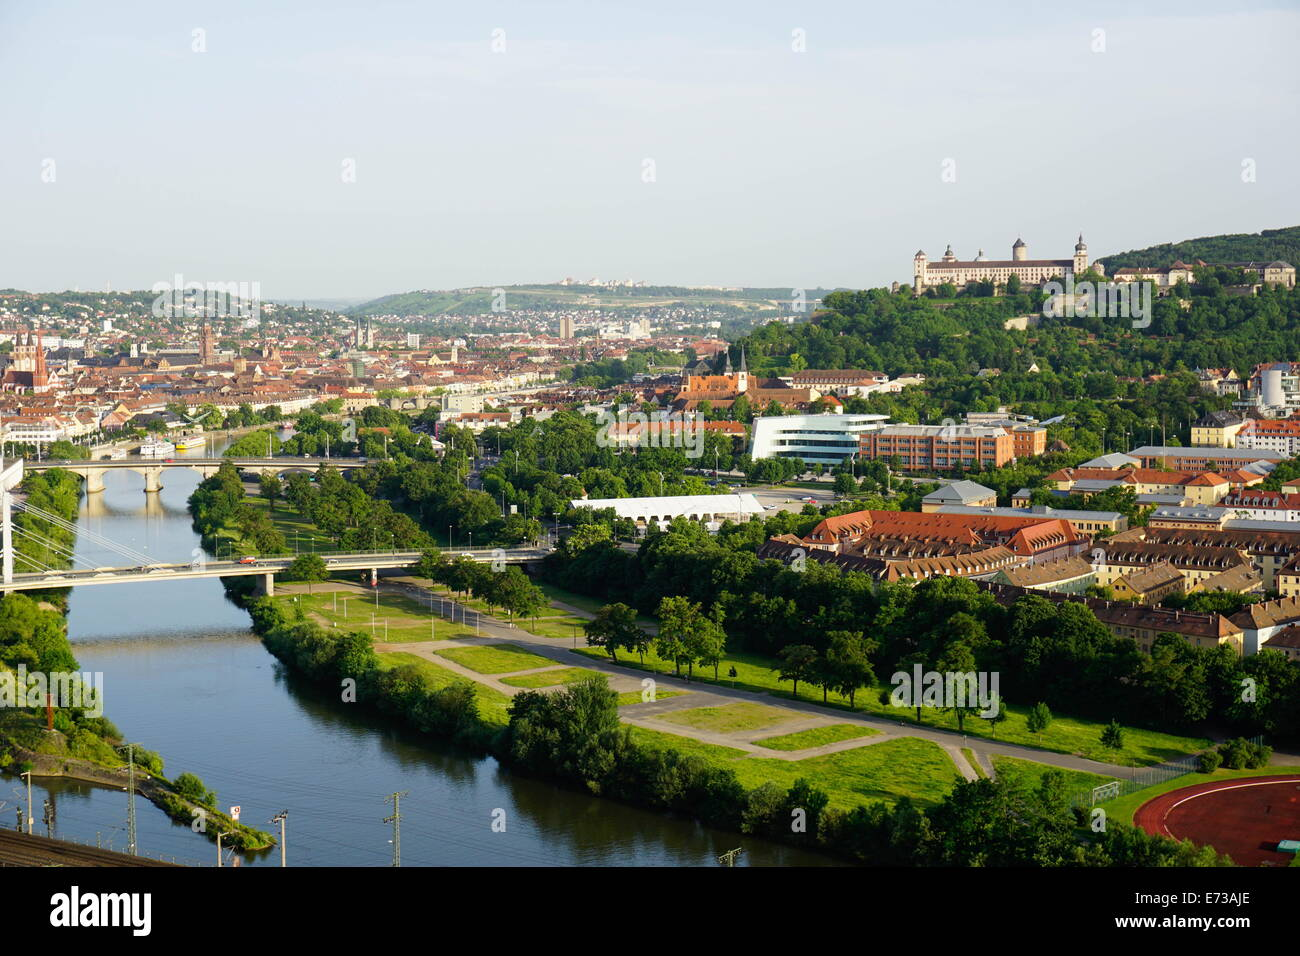 Fluss Main, Würzburg, Bayern, Deutschland, Europa Stockbild